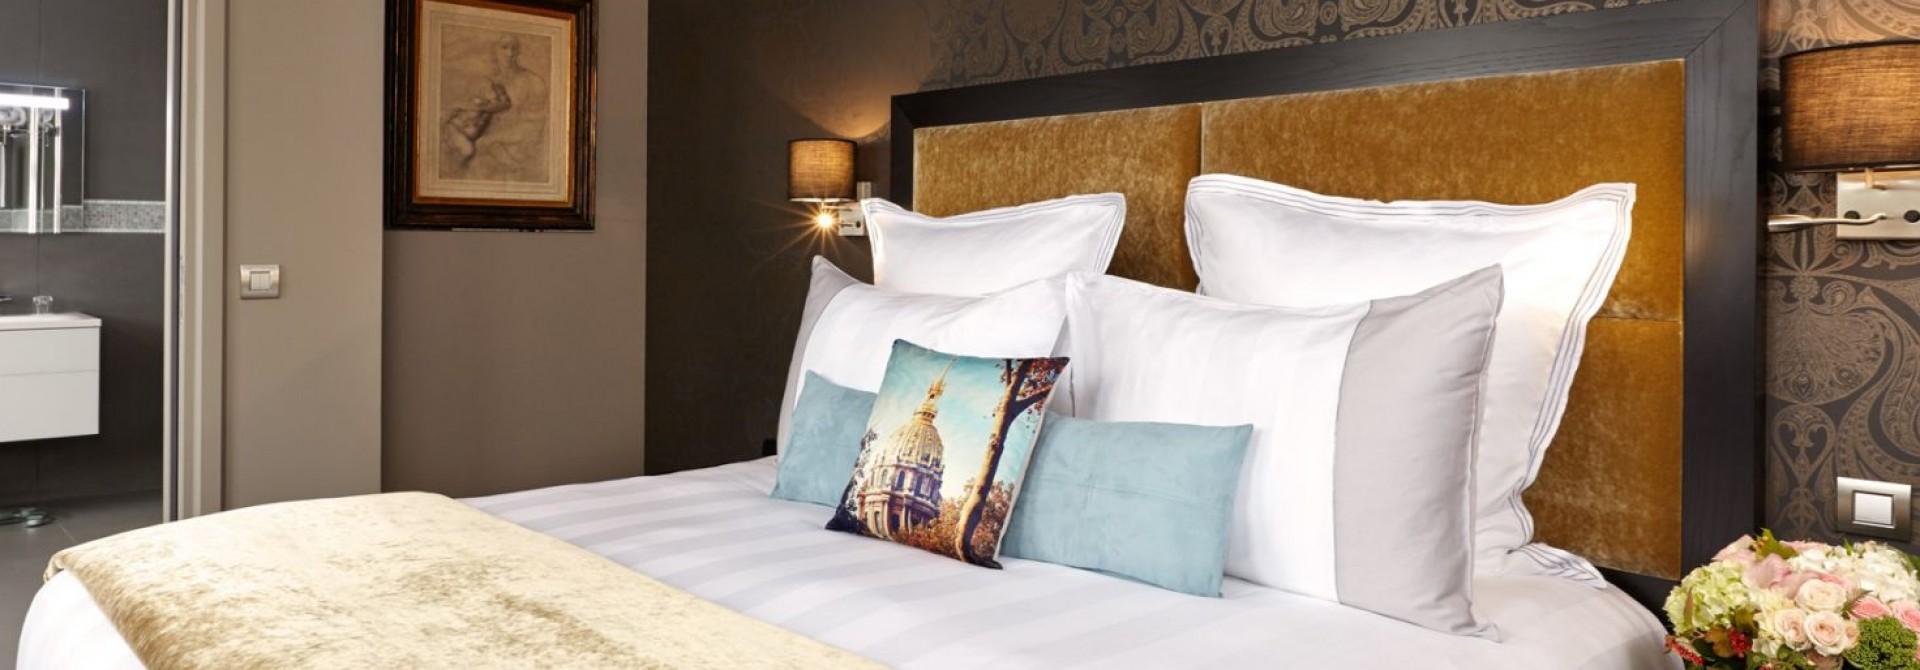 hotel juliana paris sur h tel paris. Black Bedroom Furniture Sets. Home Design Ideas